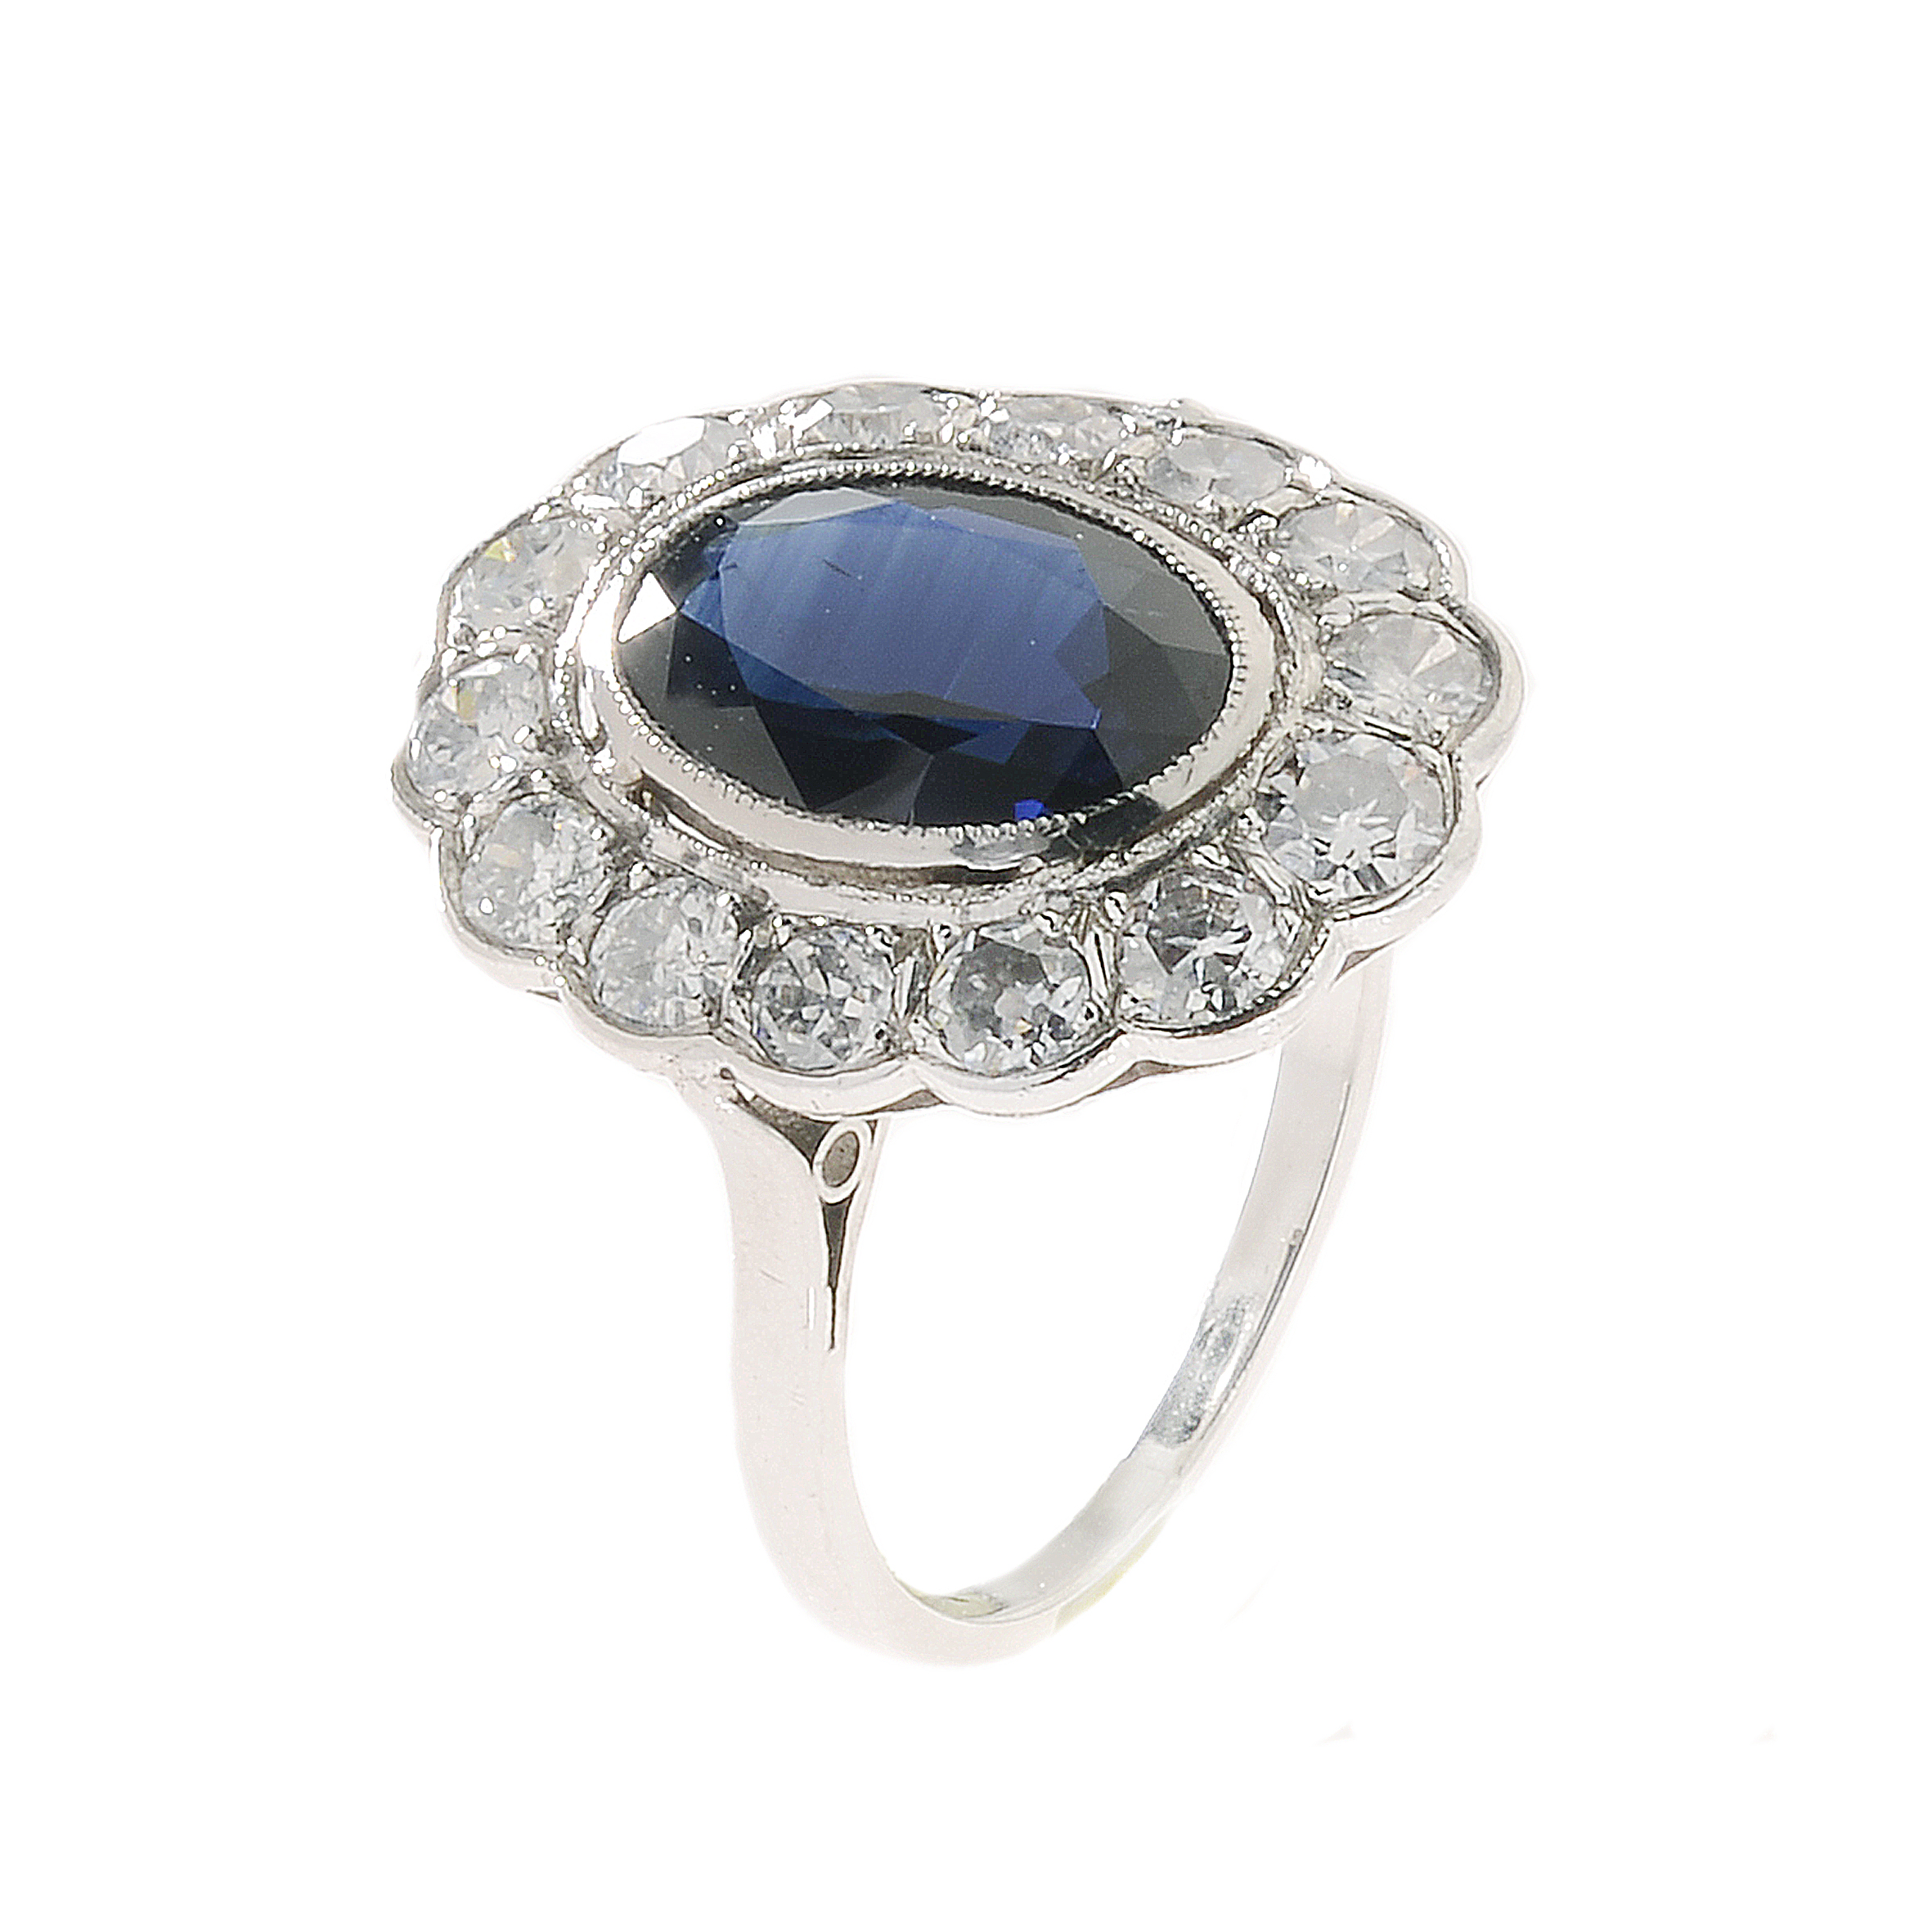 duhalde diamants bijoutier biarritz bayonne bague ancienne. Black Bedroom Furniture Sets. Home Design Ideas